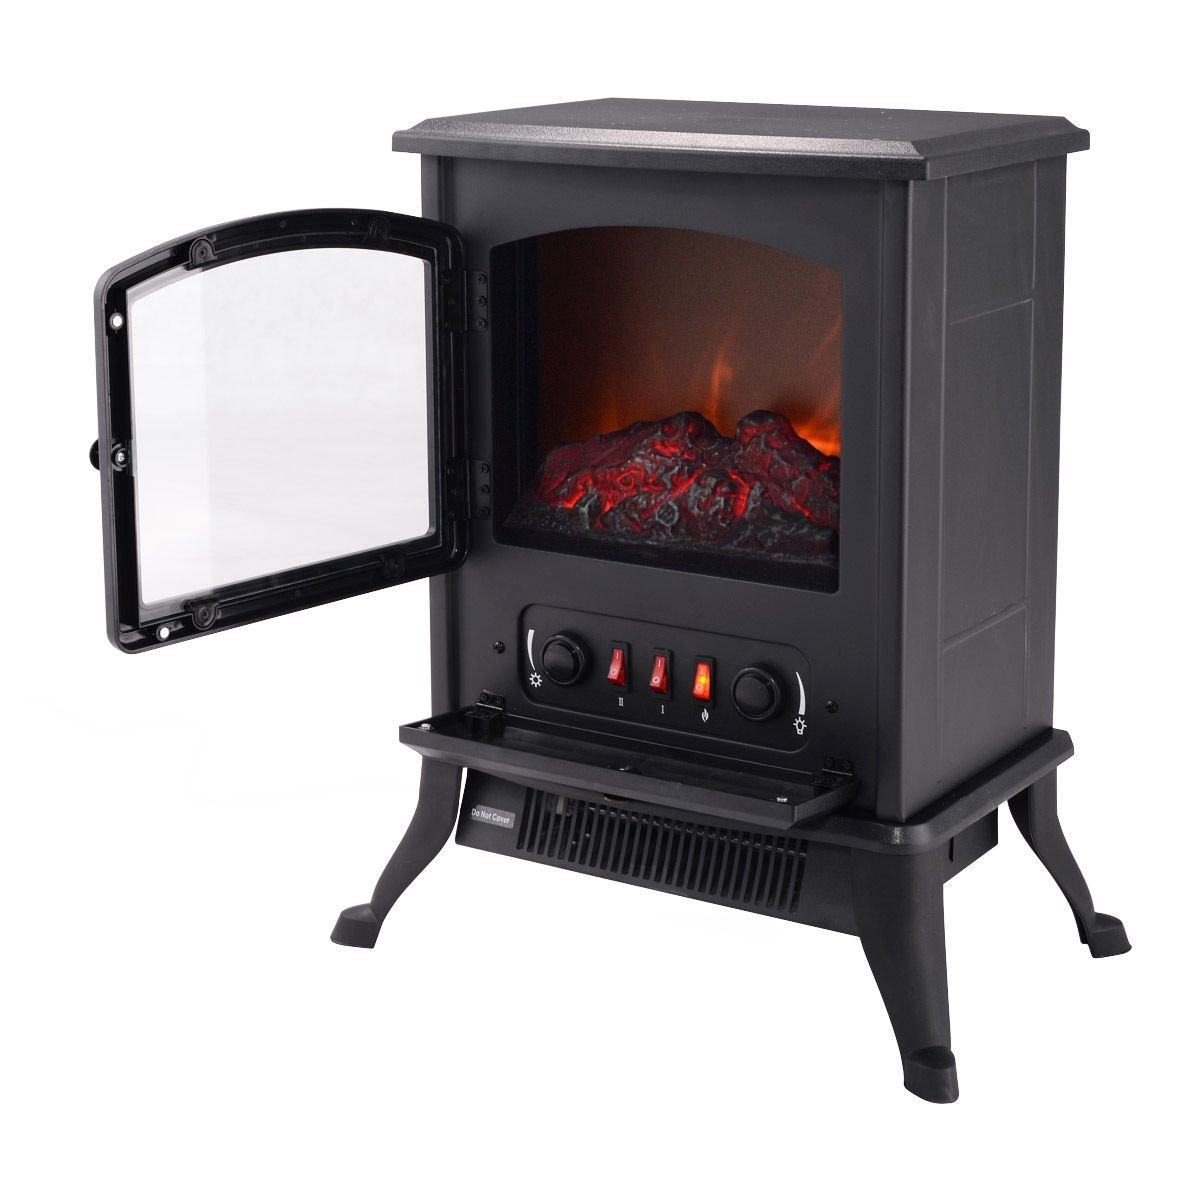 New MTN-G MTN-G Metal Electric 1000W Fireplace Quartz Tube Heater Fire Flame